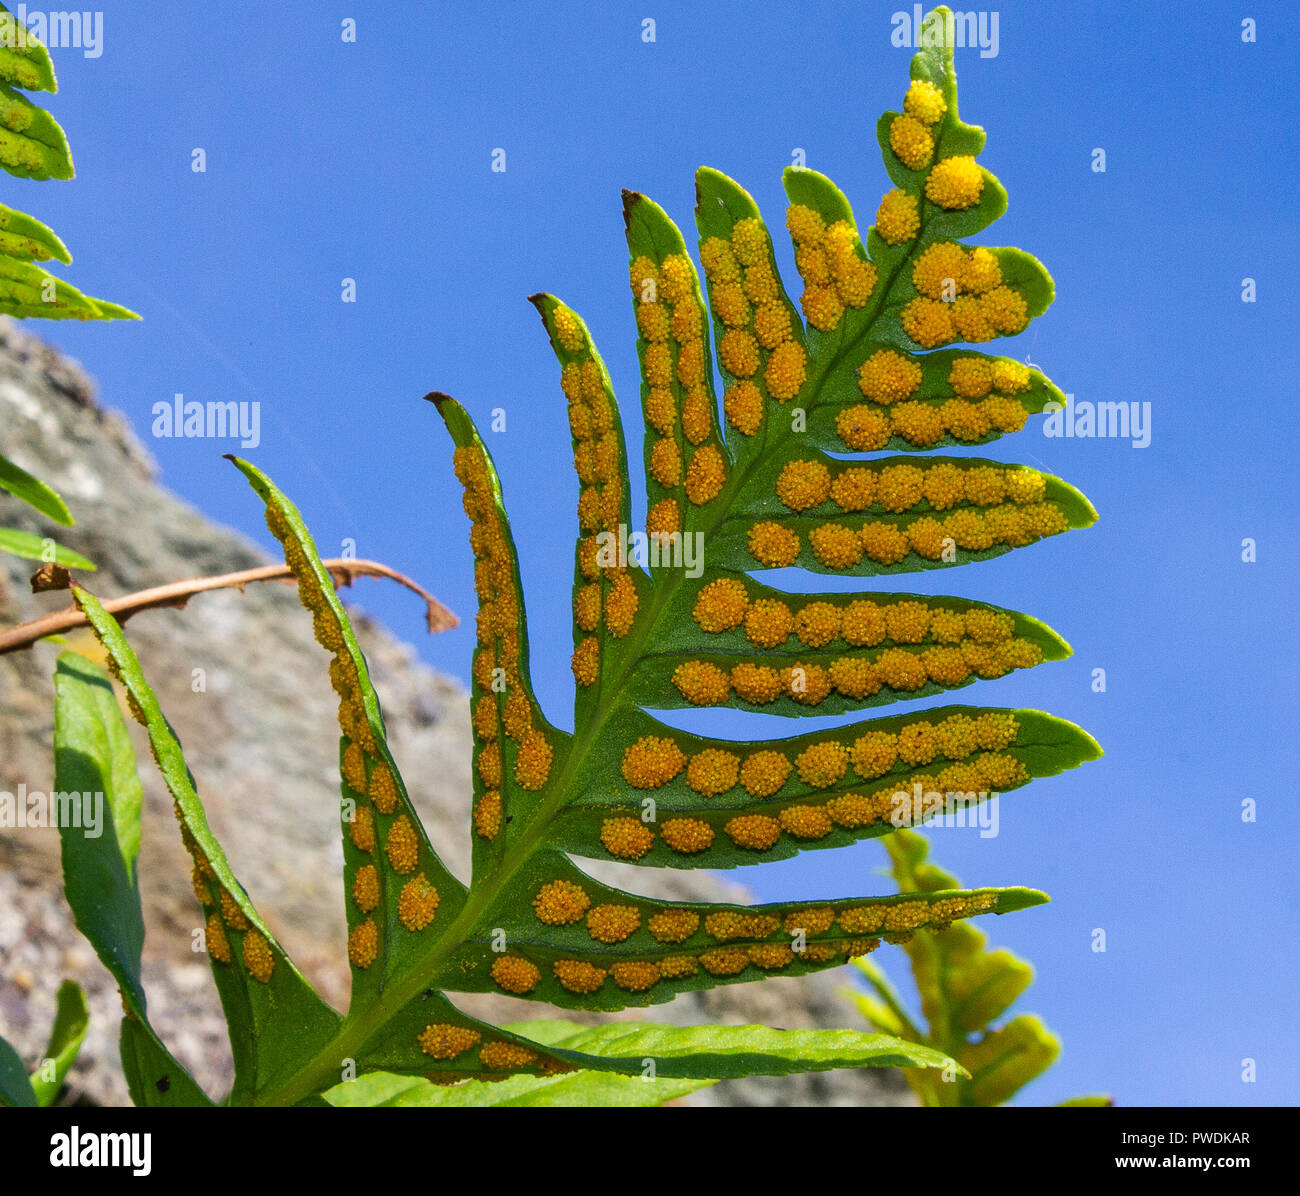 close-up-of-fern-spores-on-the-underside-of-a-fern-leaf-polypodium-cambricum-welsh-polypody-PWDKAR.jpg